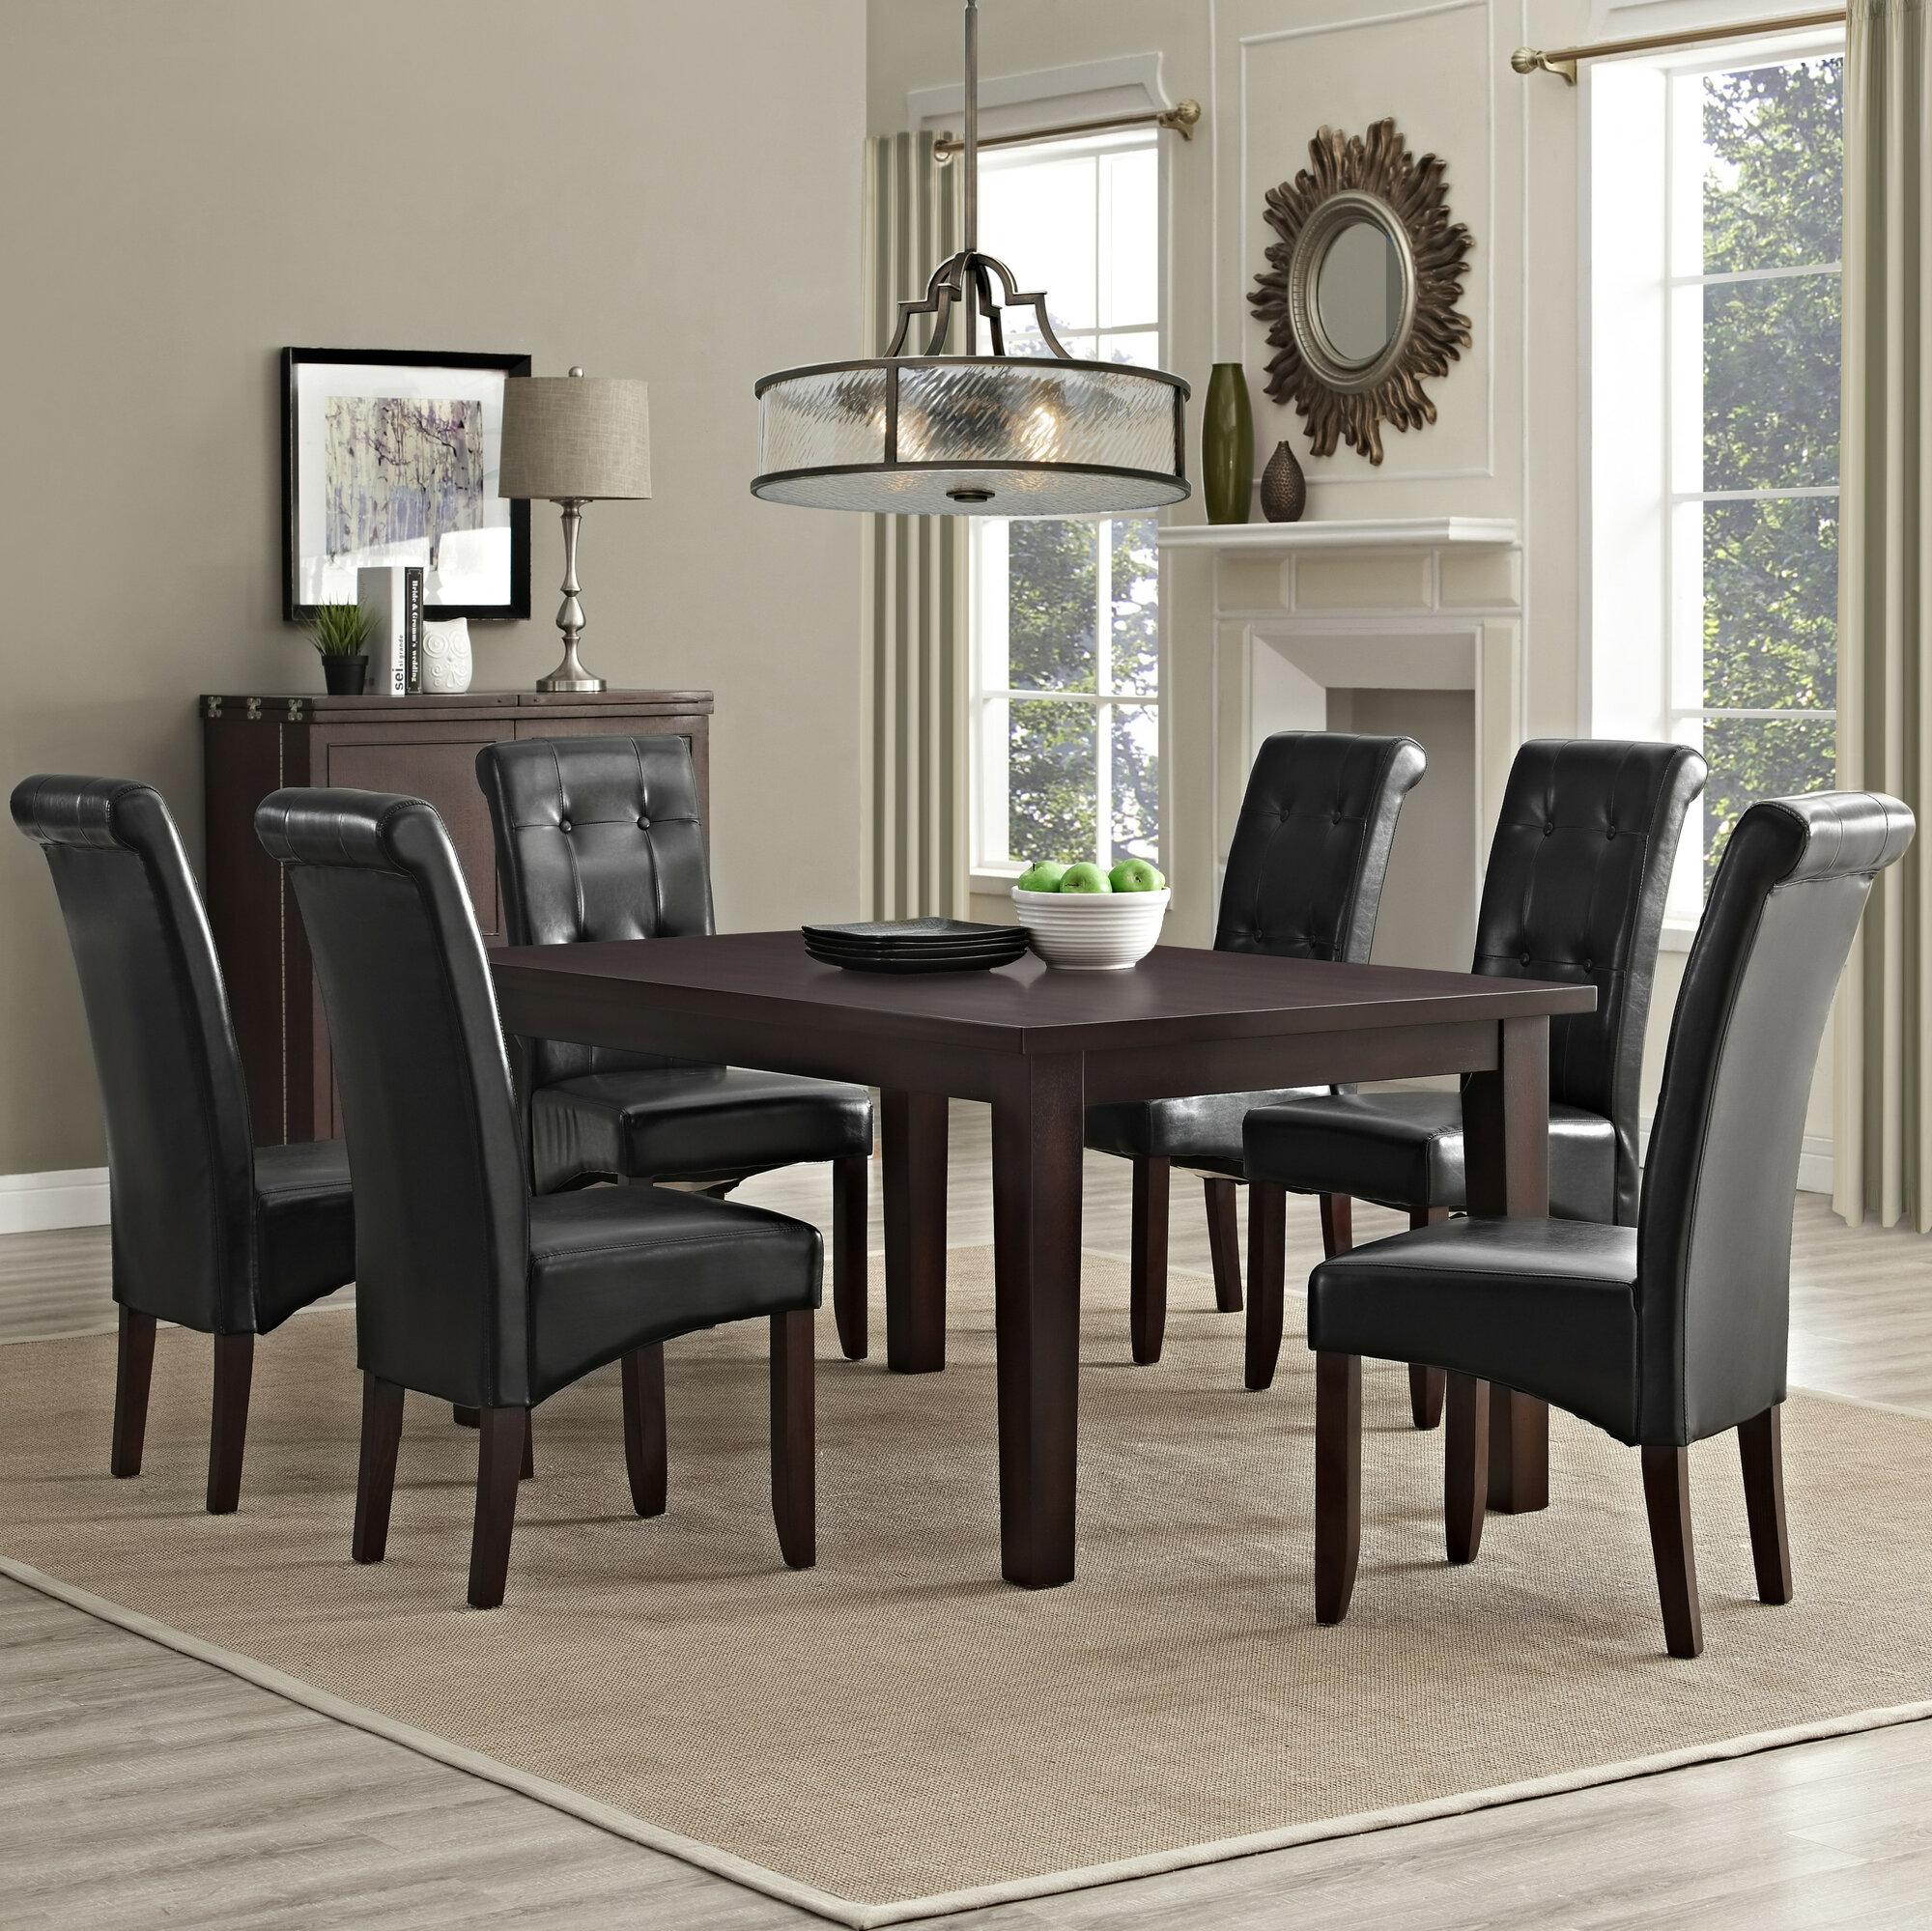 Details About Simpli Home Cosmopolitan 7 Piece Dining Set